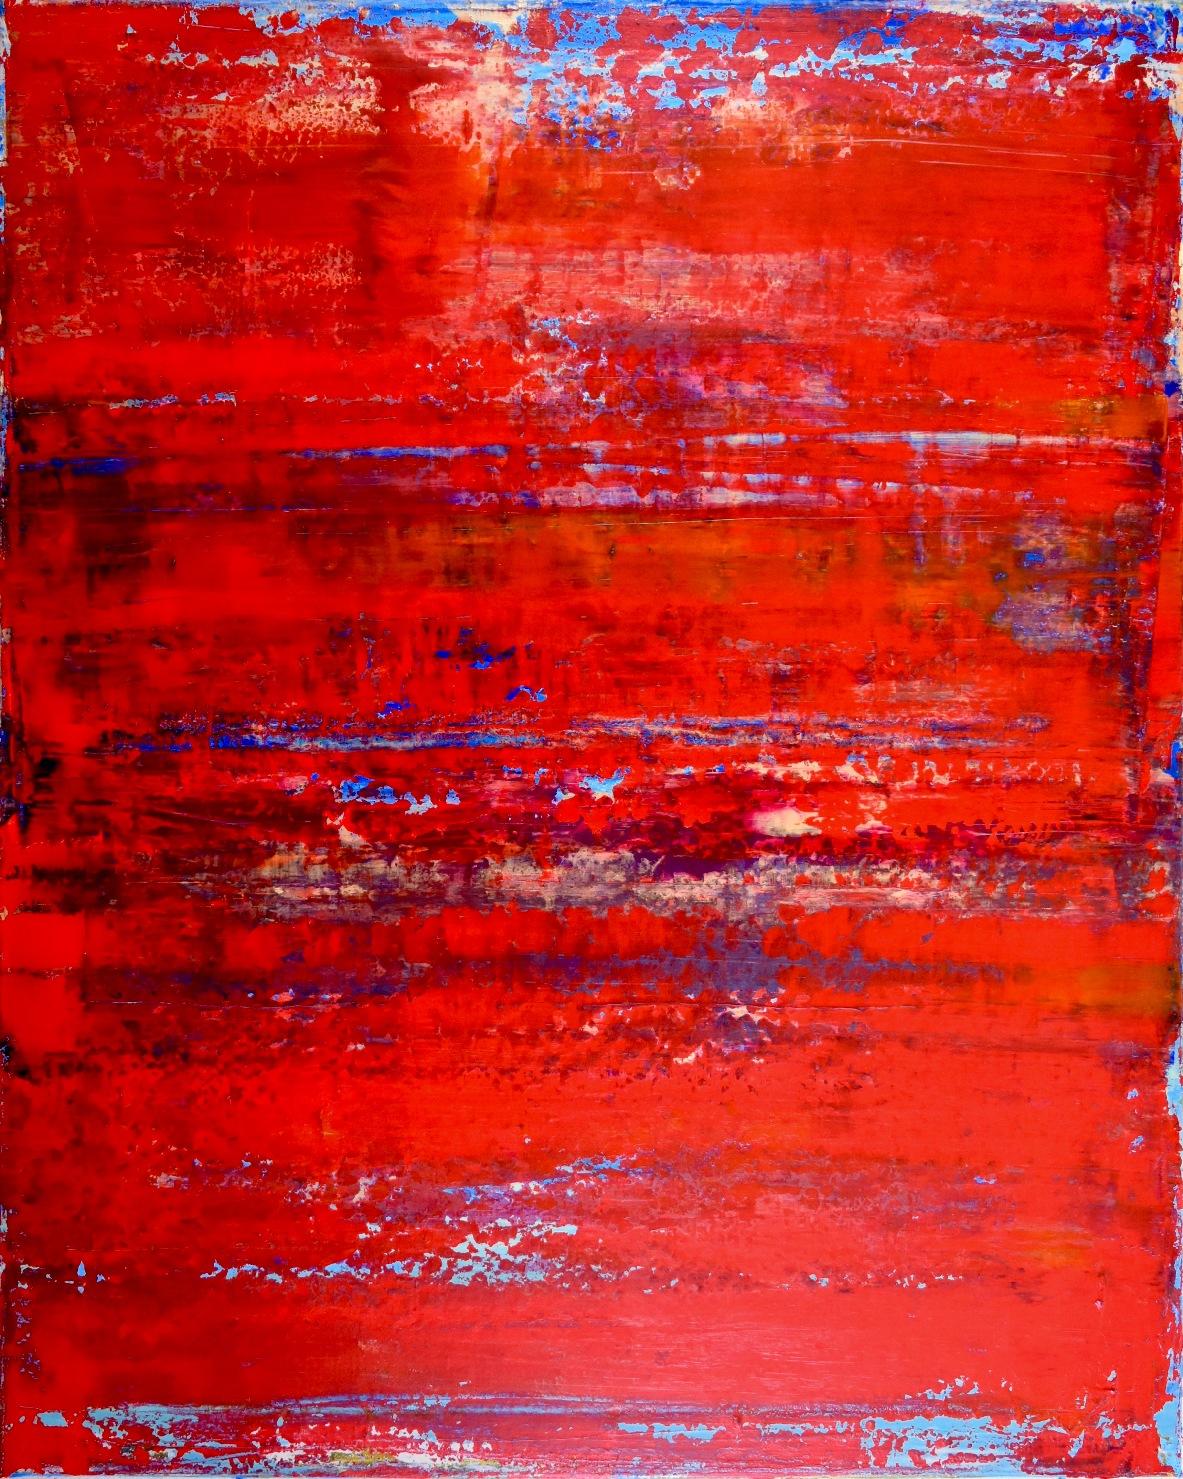 Petrified Terrain by artist Nestor Toro